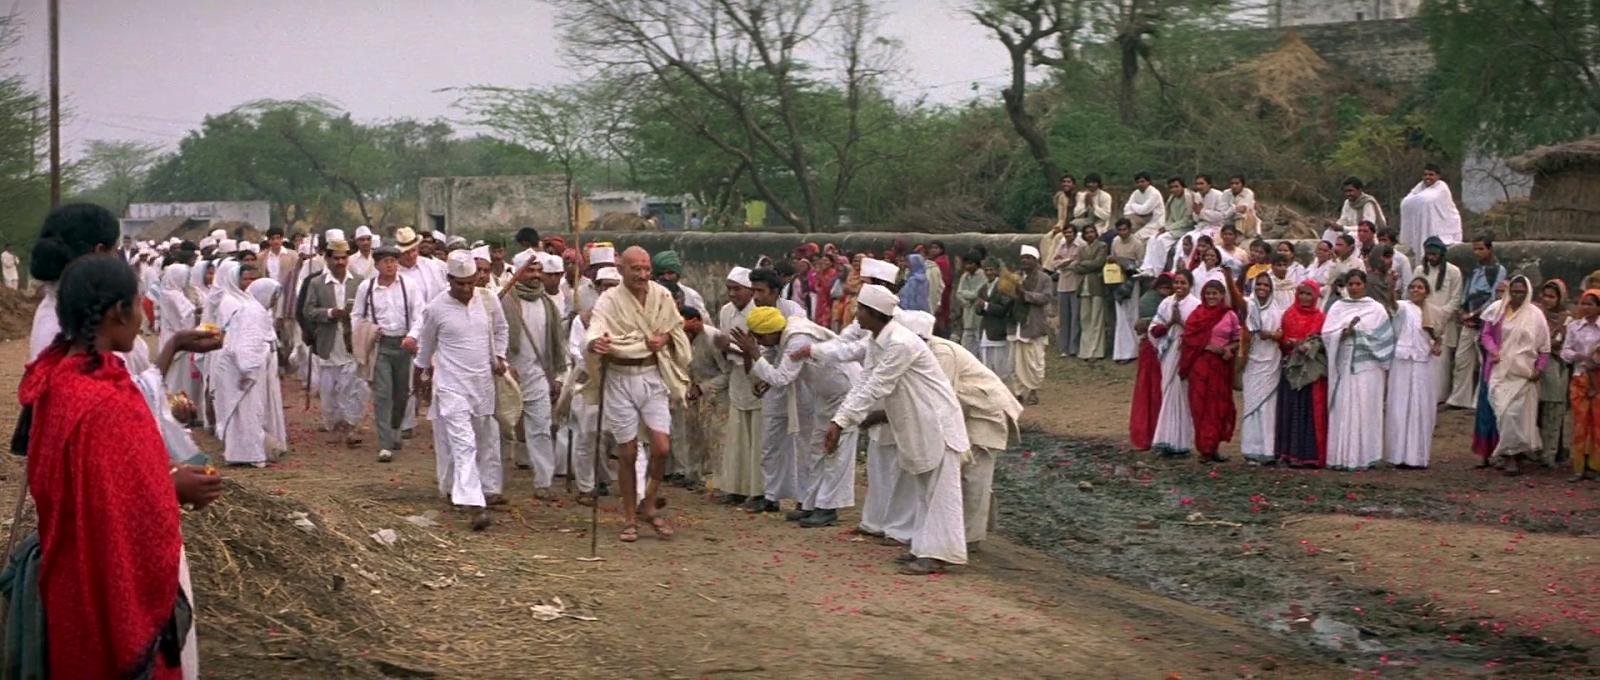 gandhi movie analysis Mahatma gandhi's personality analysis using graphology his actual character revealed in the handwriting analysis report.